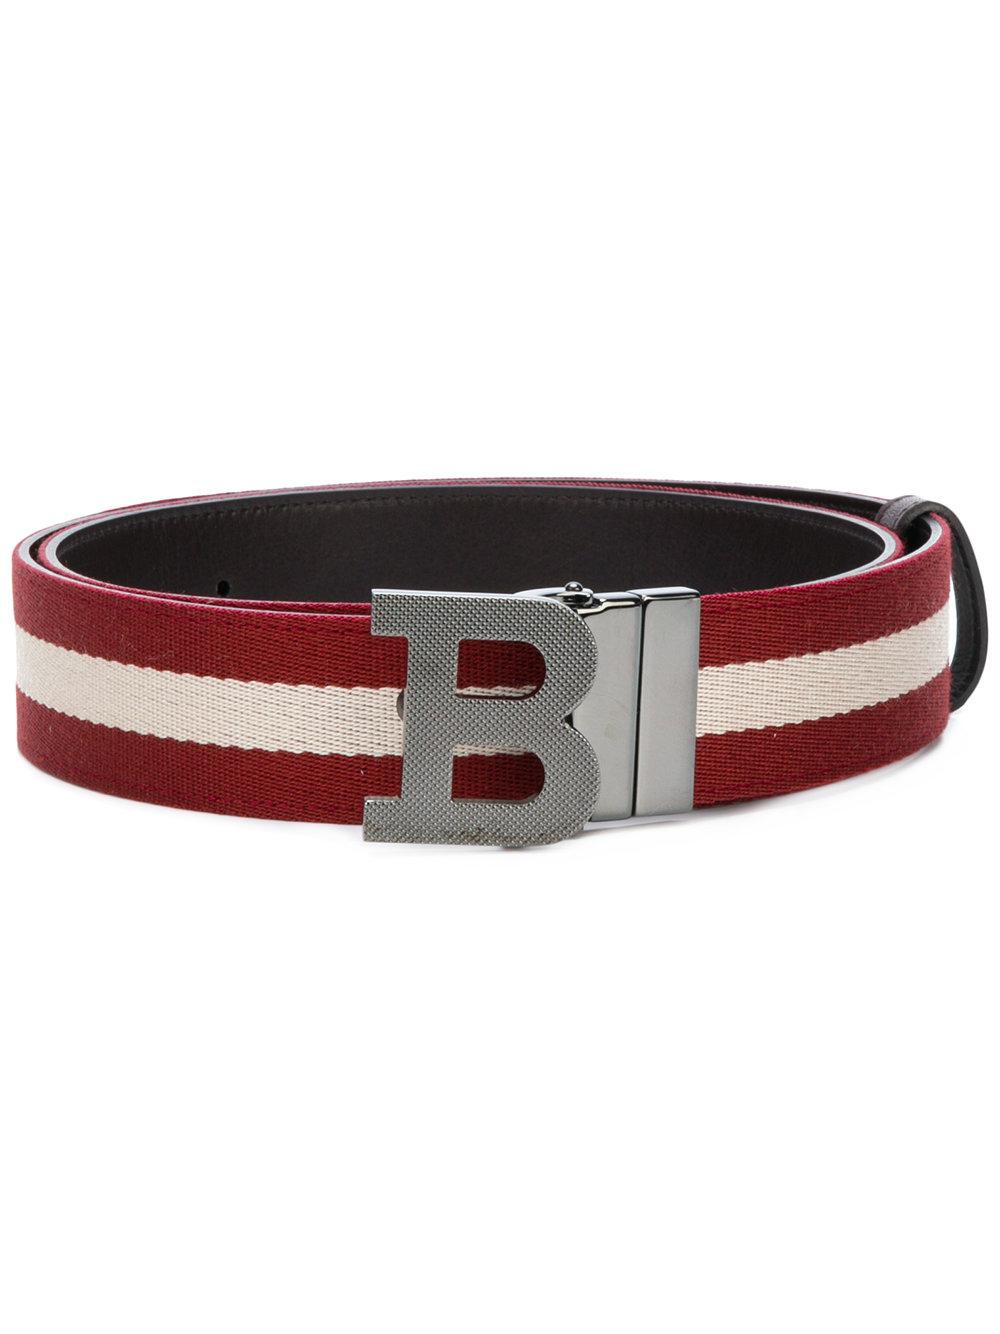 Bally B Buckle Belt - Red